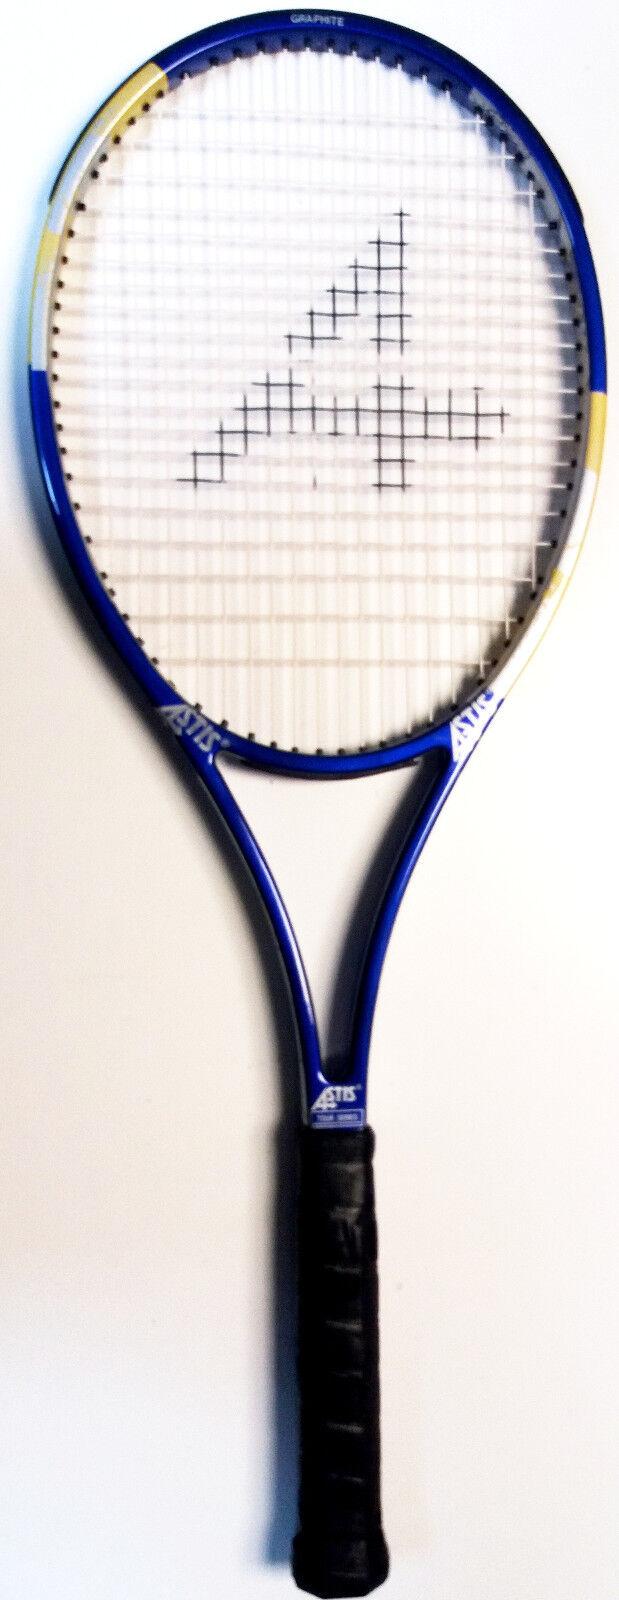 Astis Tour Edition 600 Blau Tennisschläger Tennisschläger Tennisschläger f47d8d